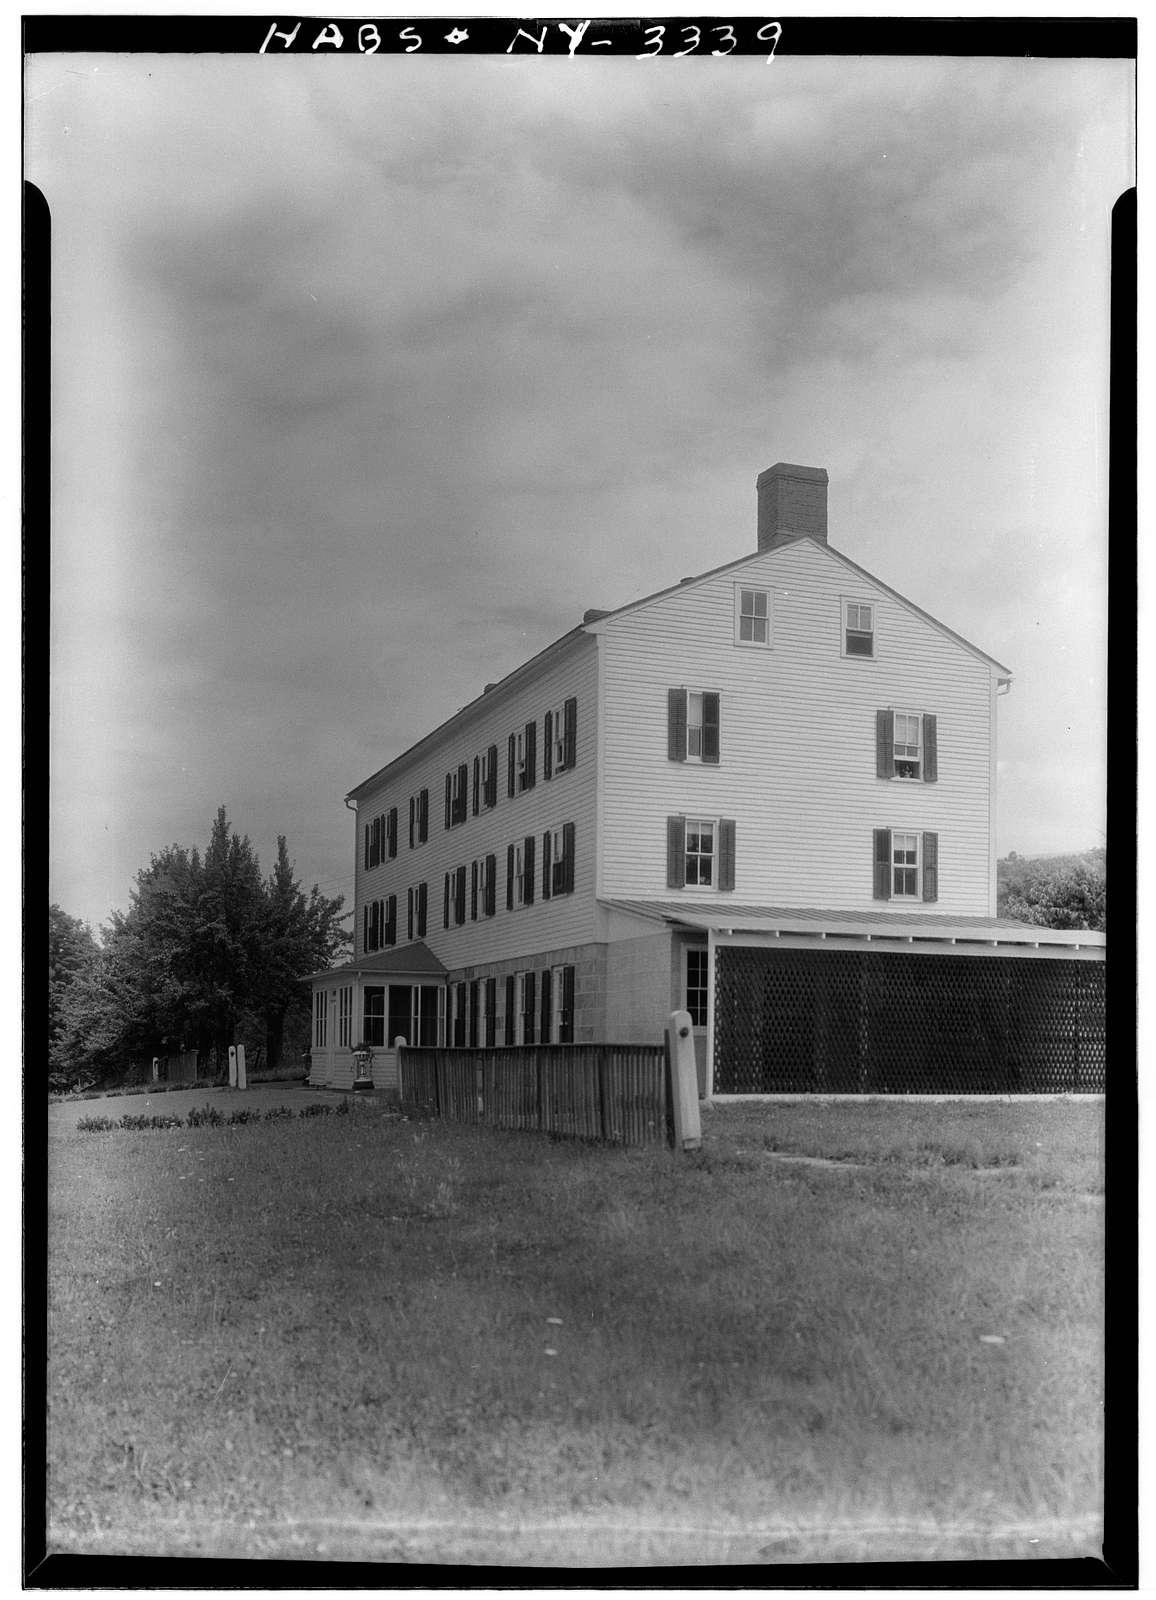 Shaker Centre Family Dwelling House (second), Shaker Road, New Lebanon, Columbia County, NY